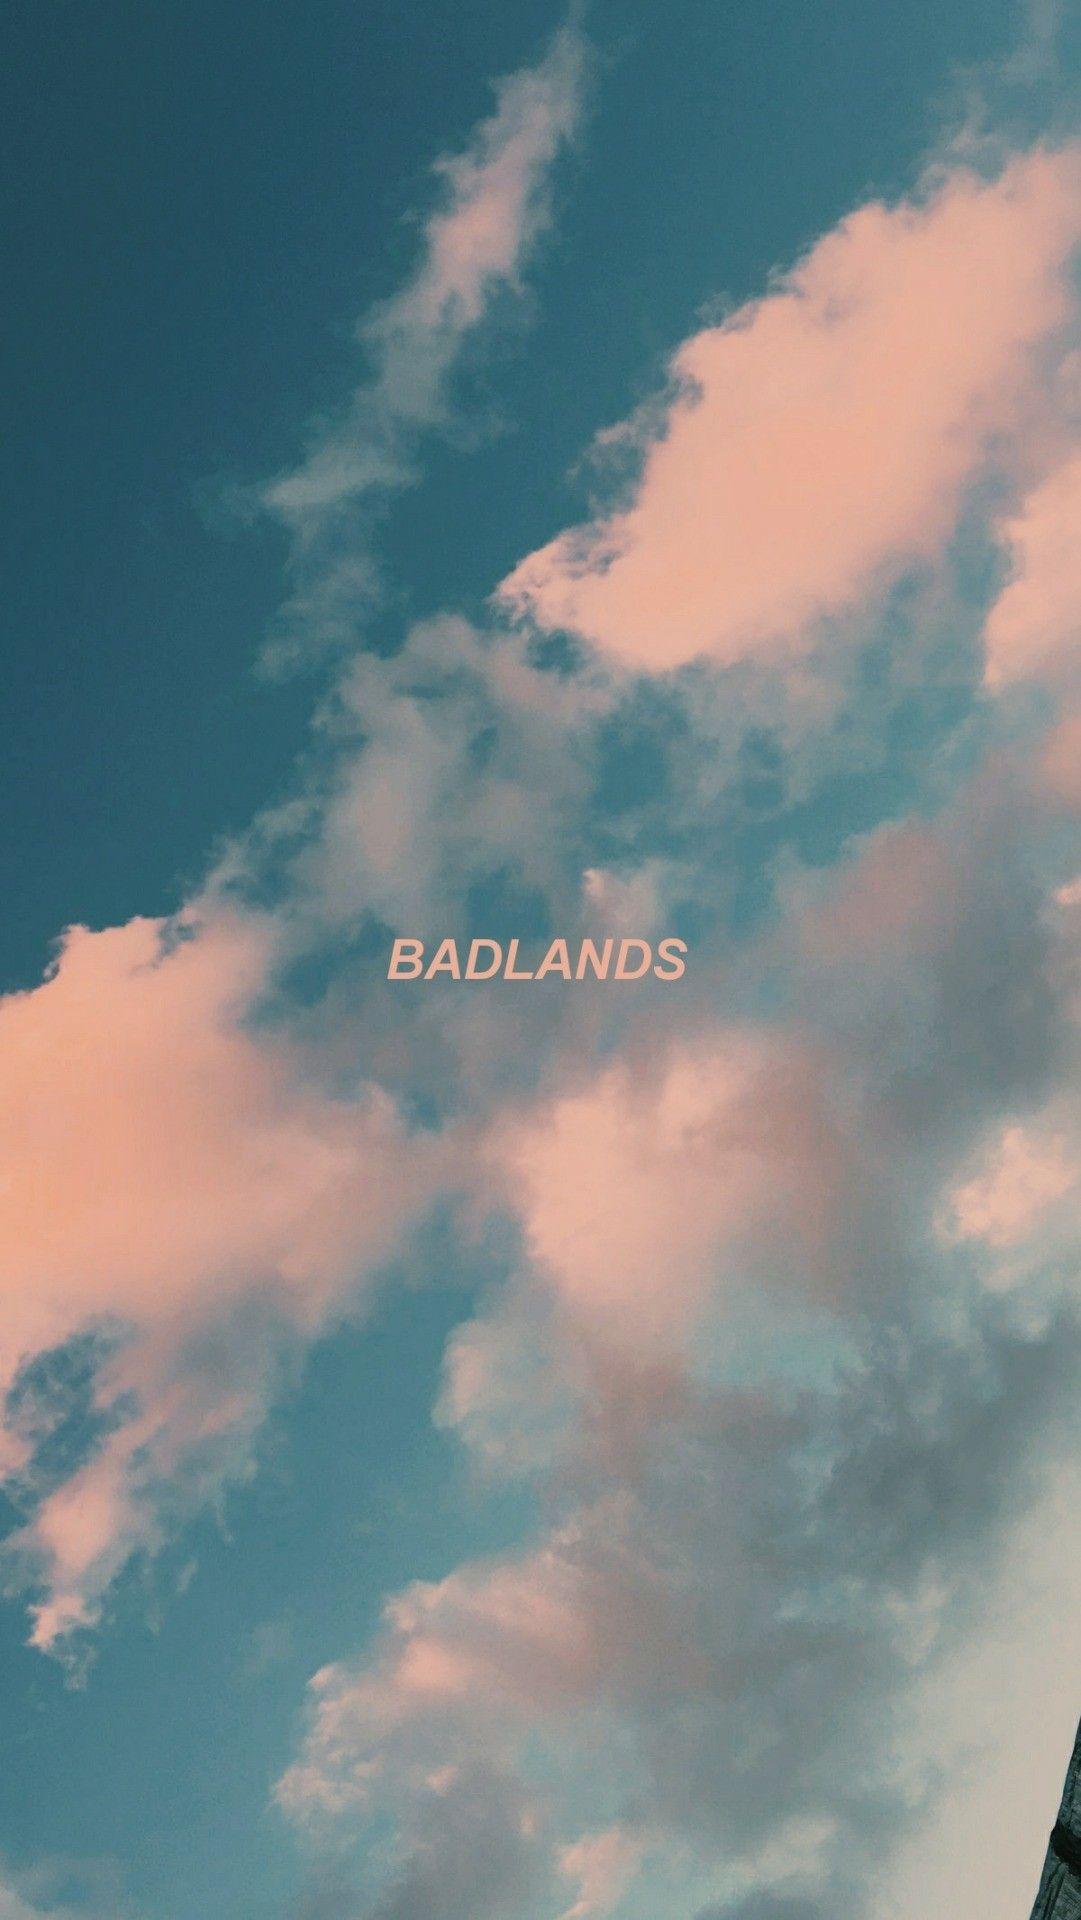 Badlands Halsey Badlands Halsey Future Wallpaper